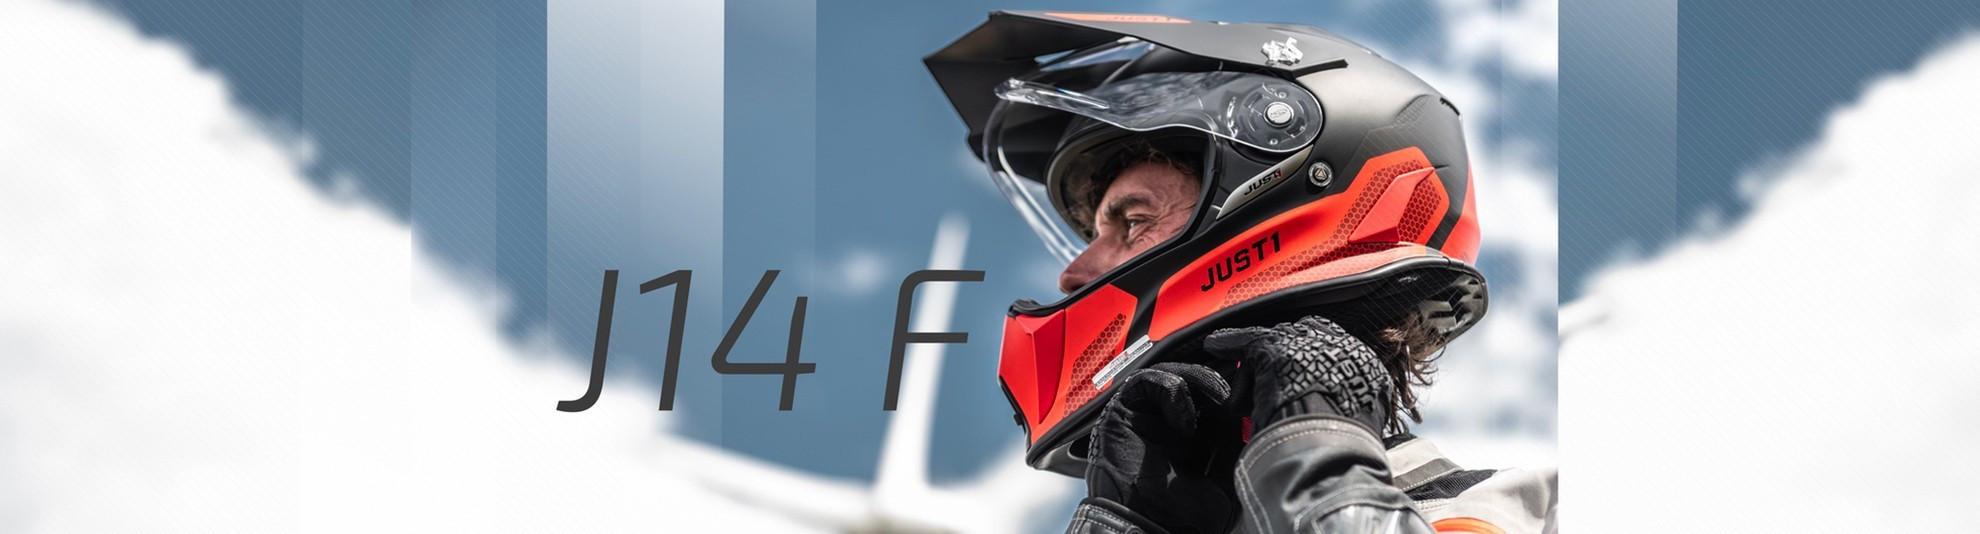 J14F - FIBERGLASS